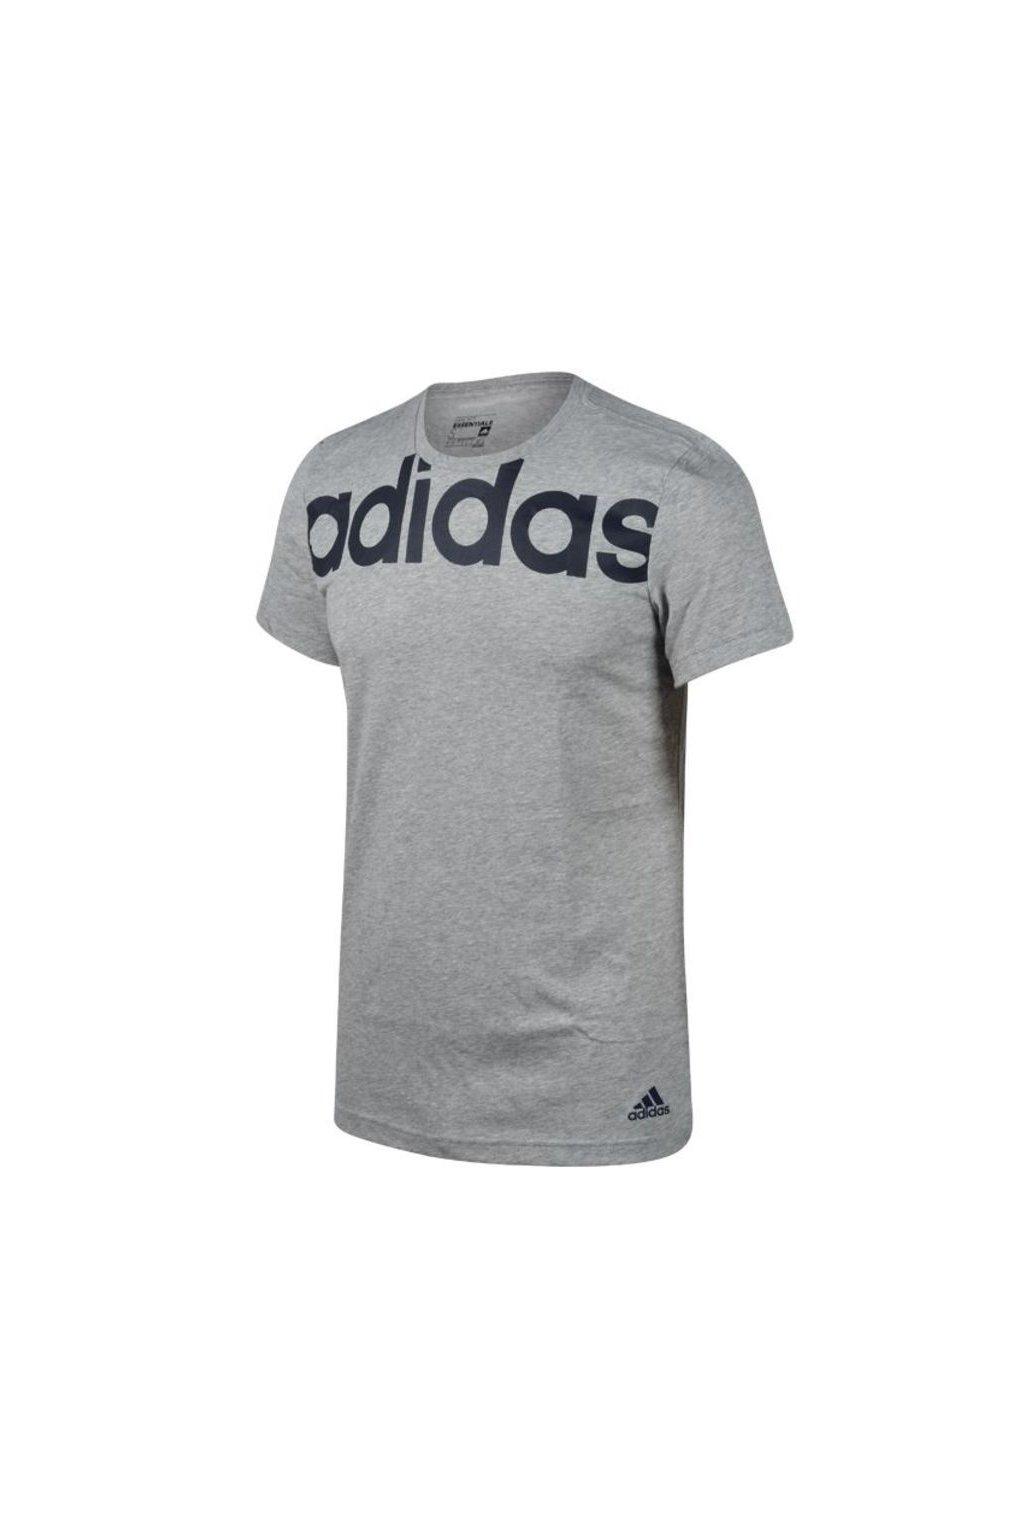 1af79612811b ADIDAS CLIMALITE pánske tričko